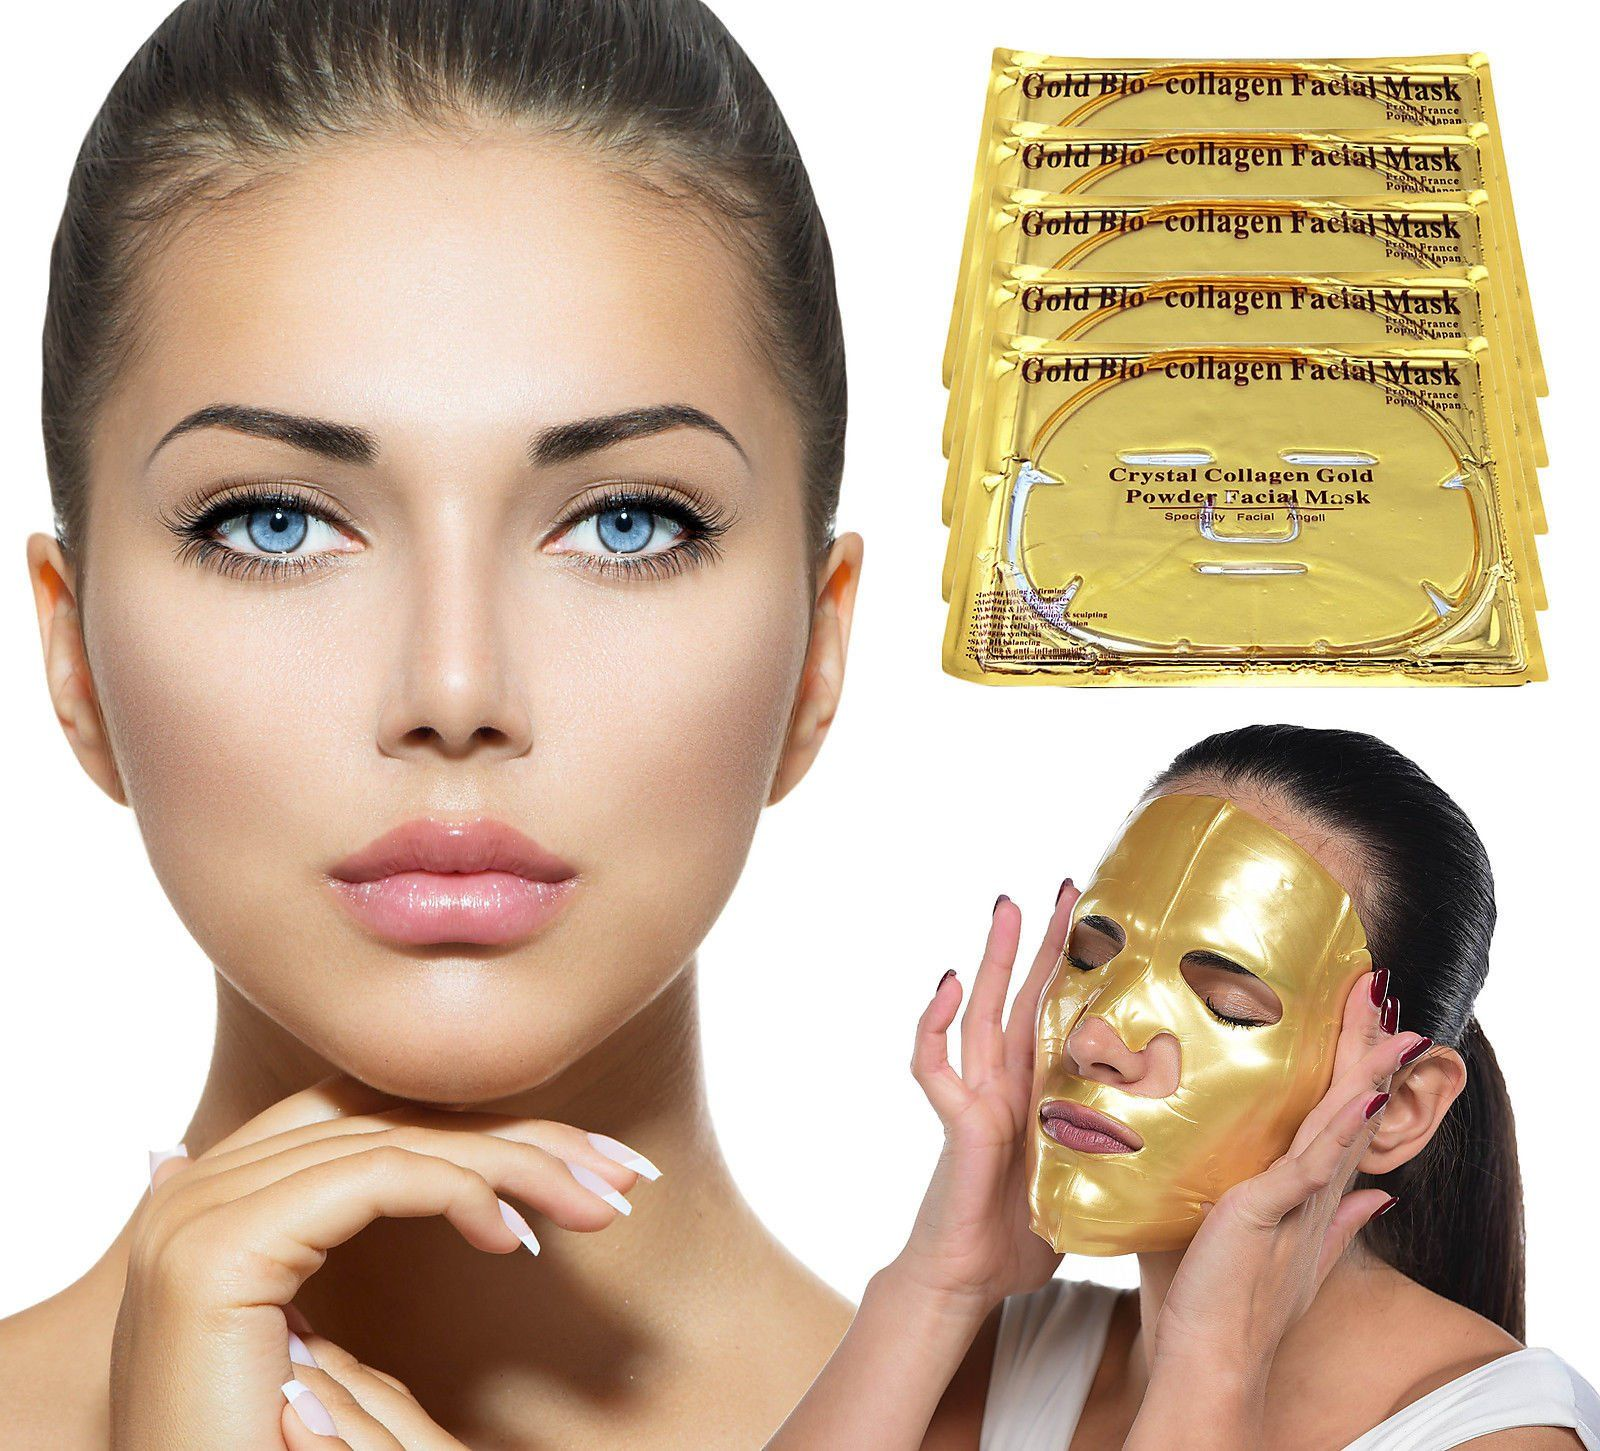 Gold Bio Collagen Face Mask Puffy eye treatment